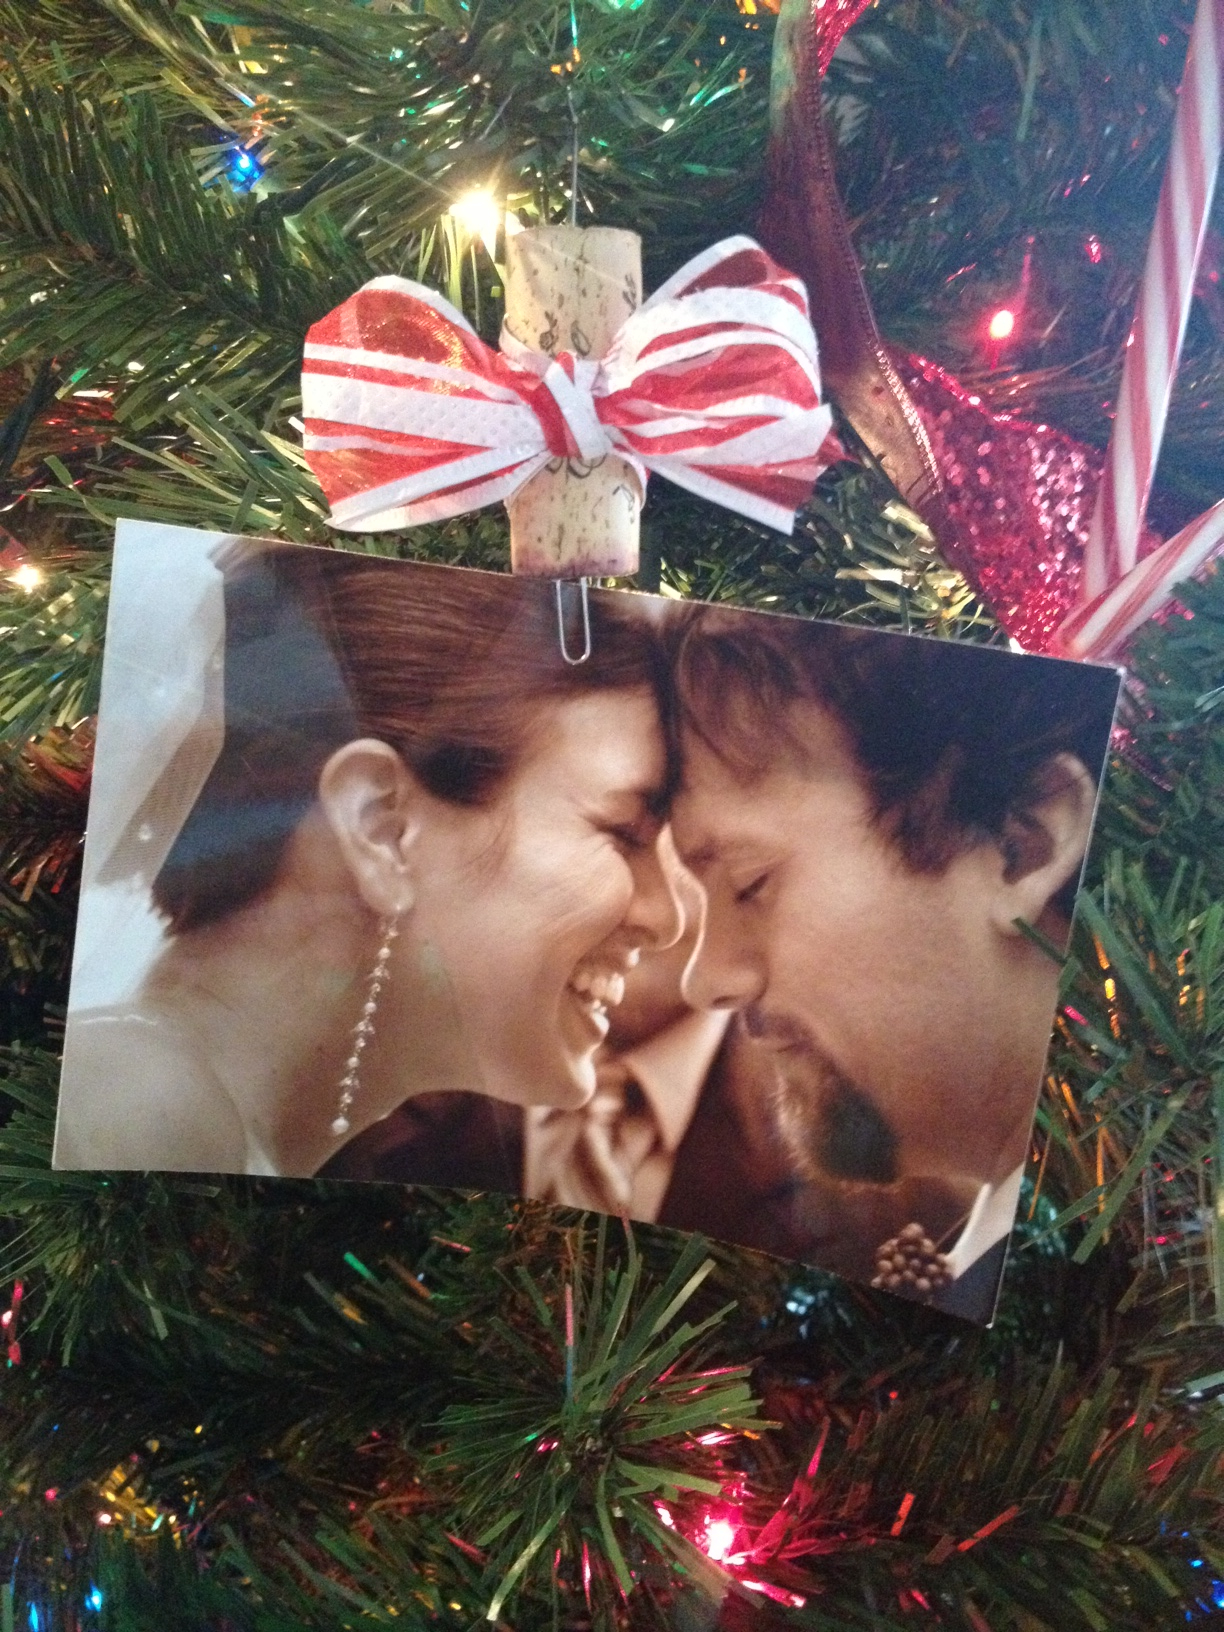 wedding ornament photo